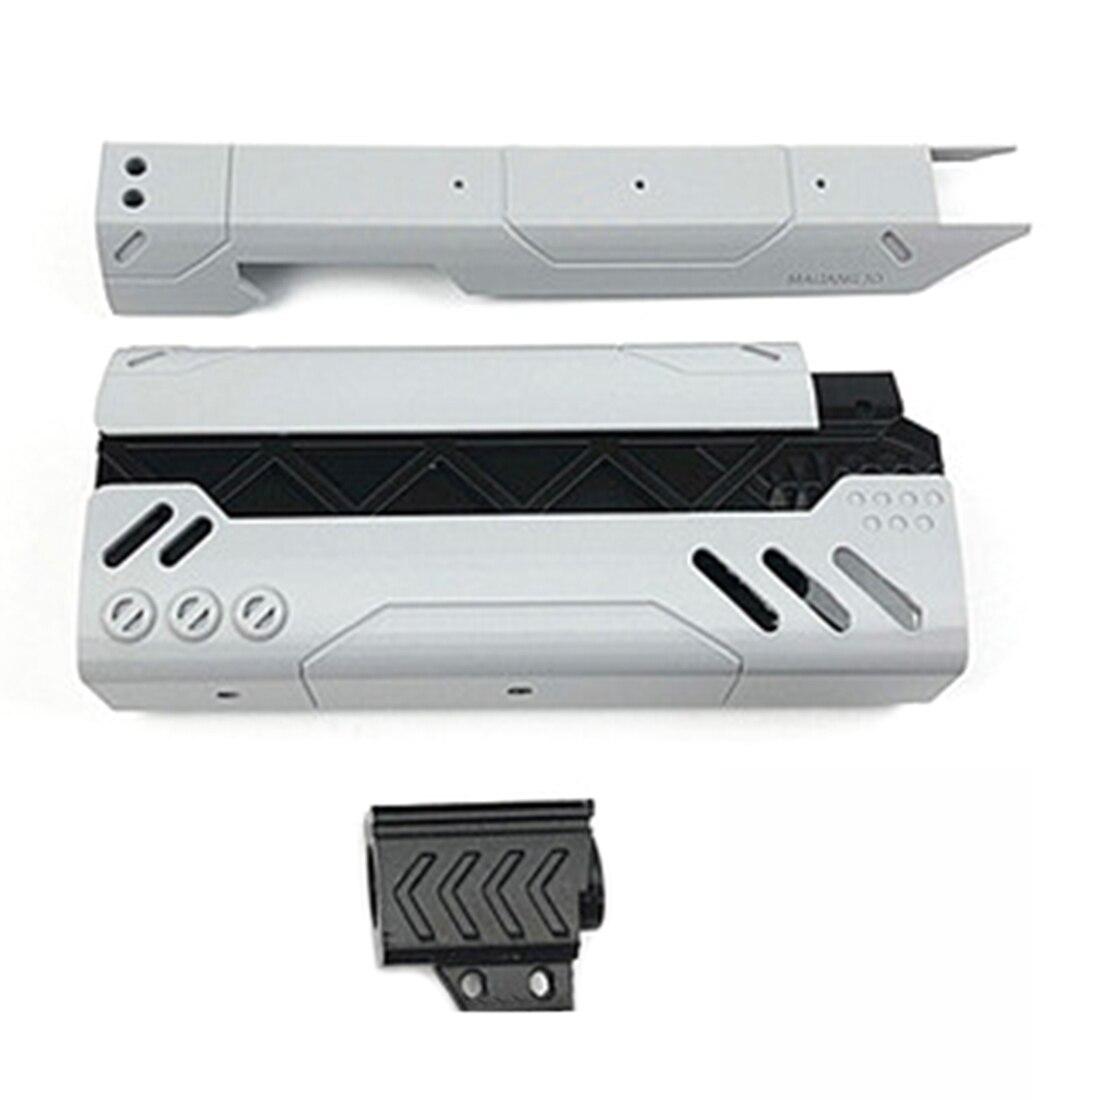 ML 3D Printing 200mm MOD2 Appearence Modification Kit for Nerf Zombie Strike SlingFire Blaster - Black + Grey